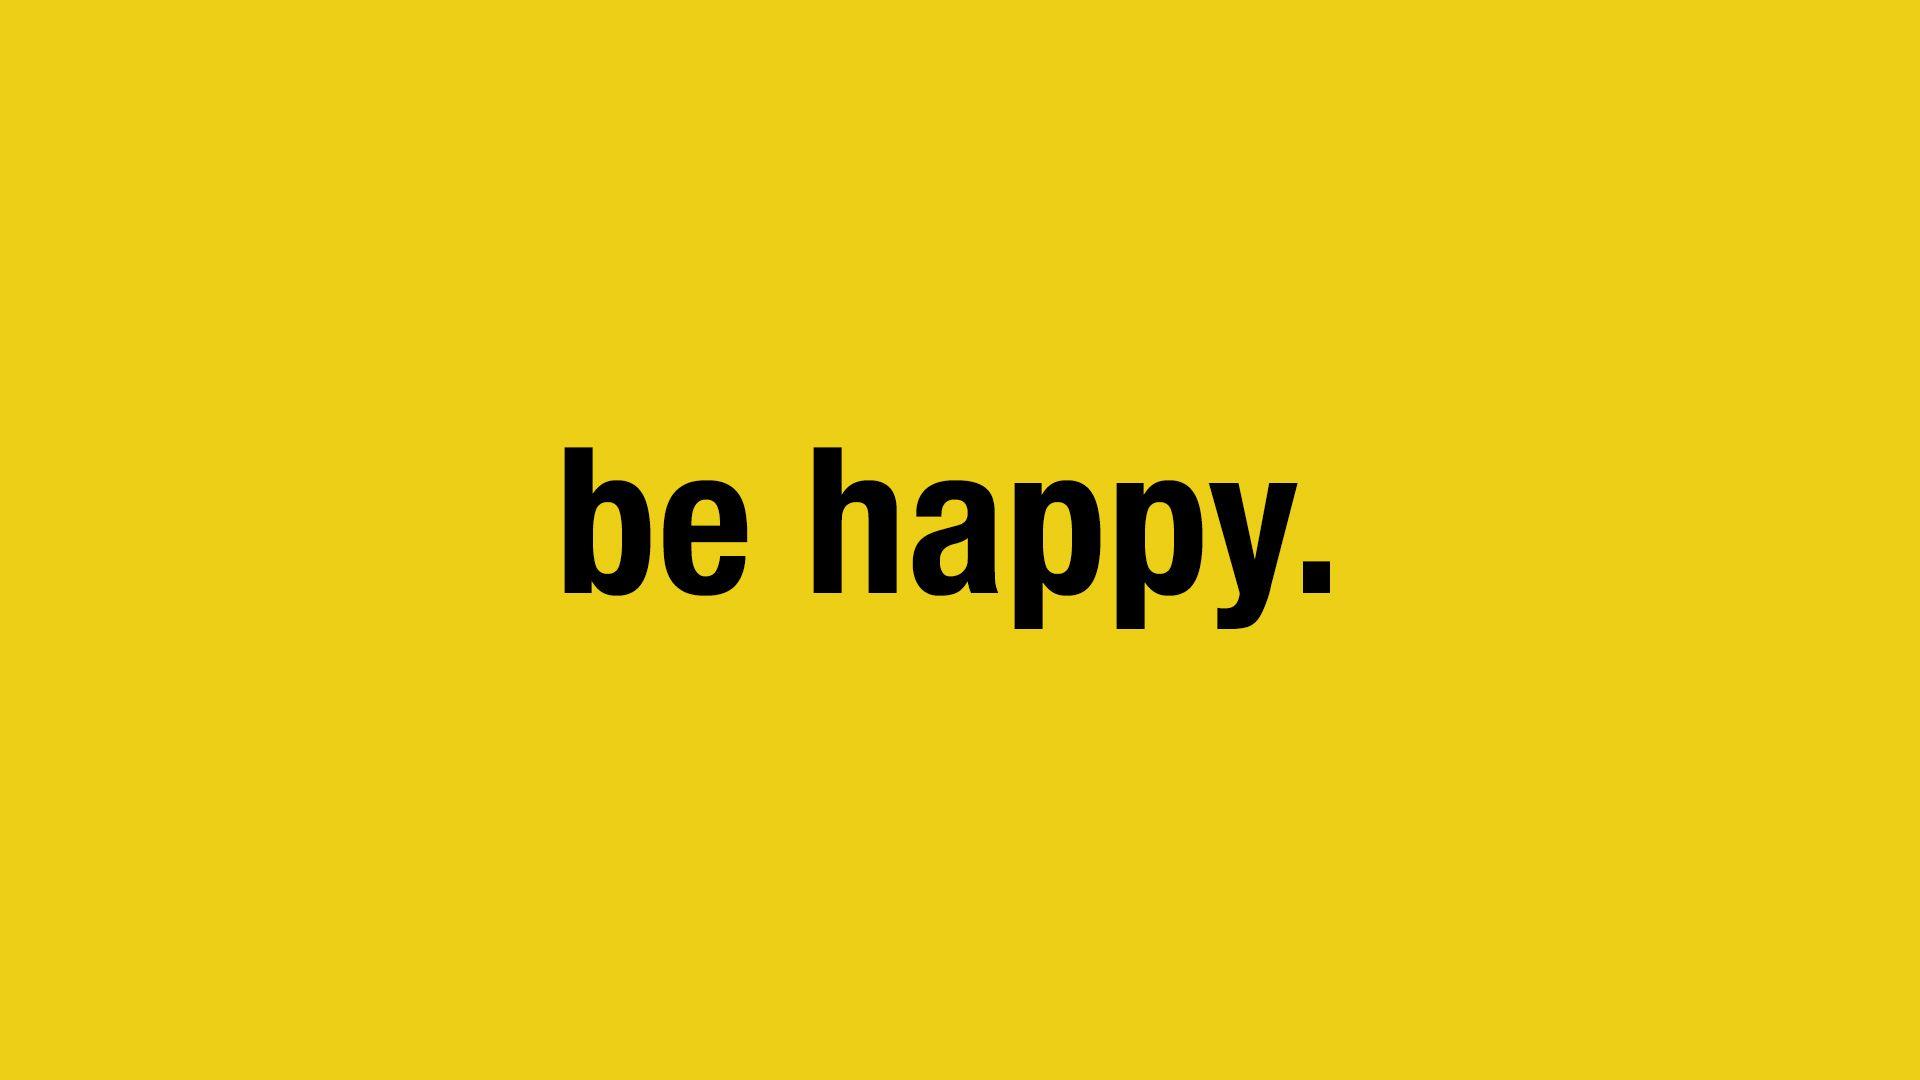 BE HAPPY SHIRTS